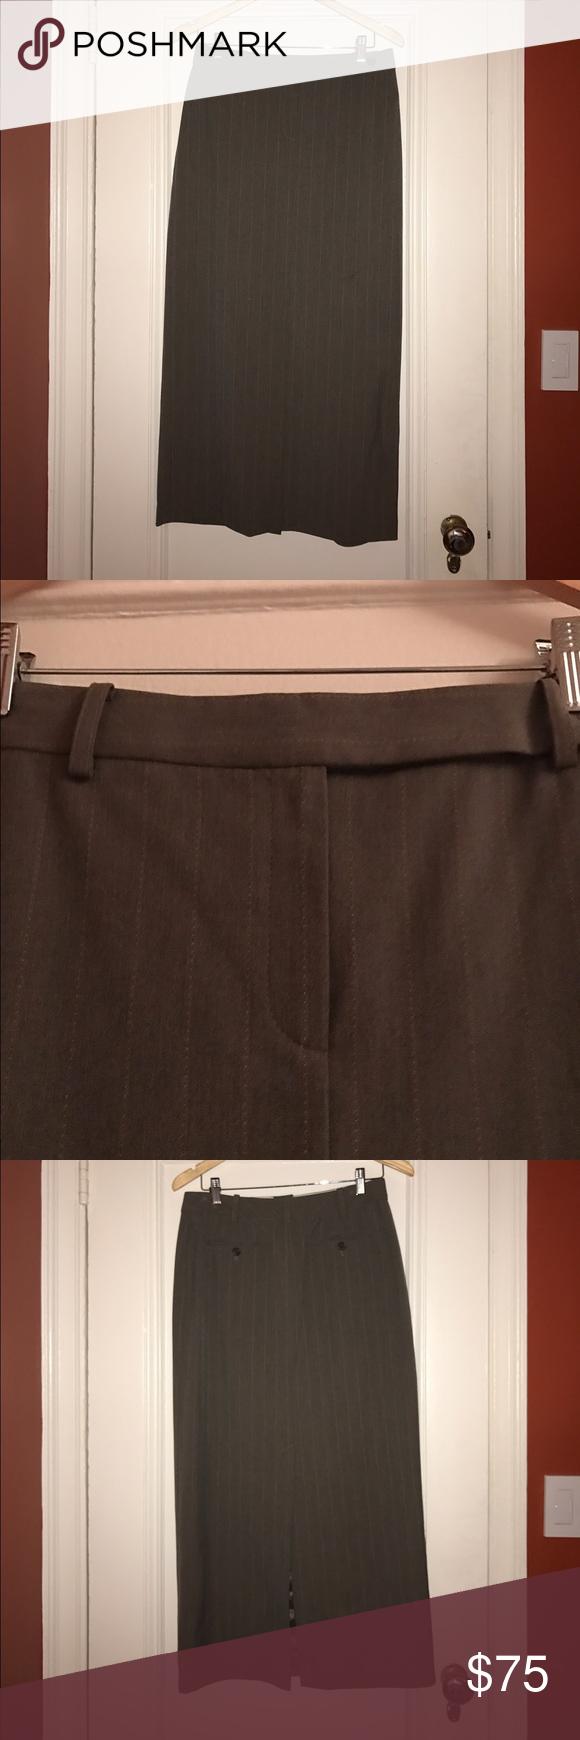 Michael Kors gray pinstripe back slit maxi skirt Michael Kors gray pinstripe back slit maxi skirt MICHAEL Michael Kors Skirts Maxi